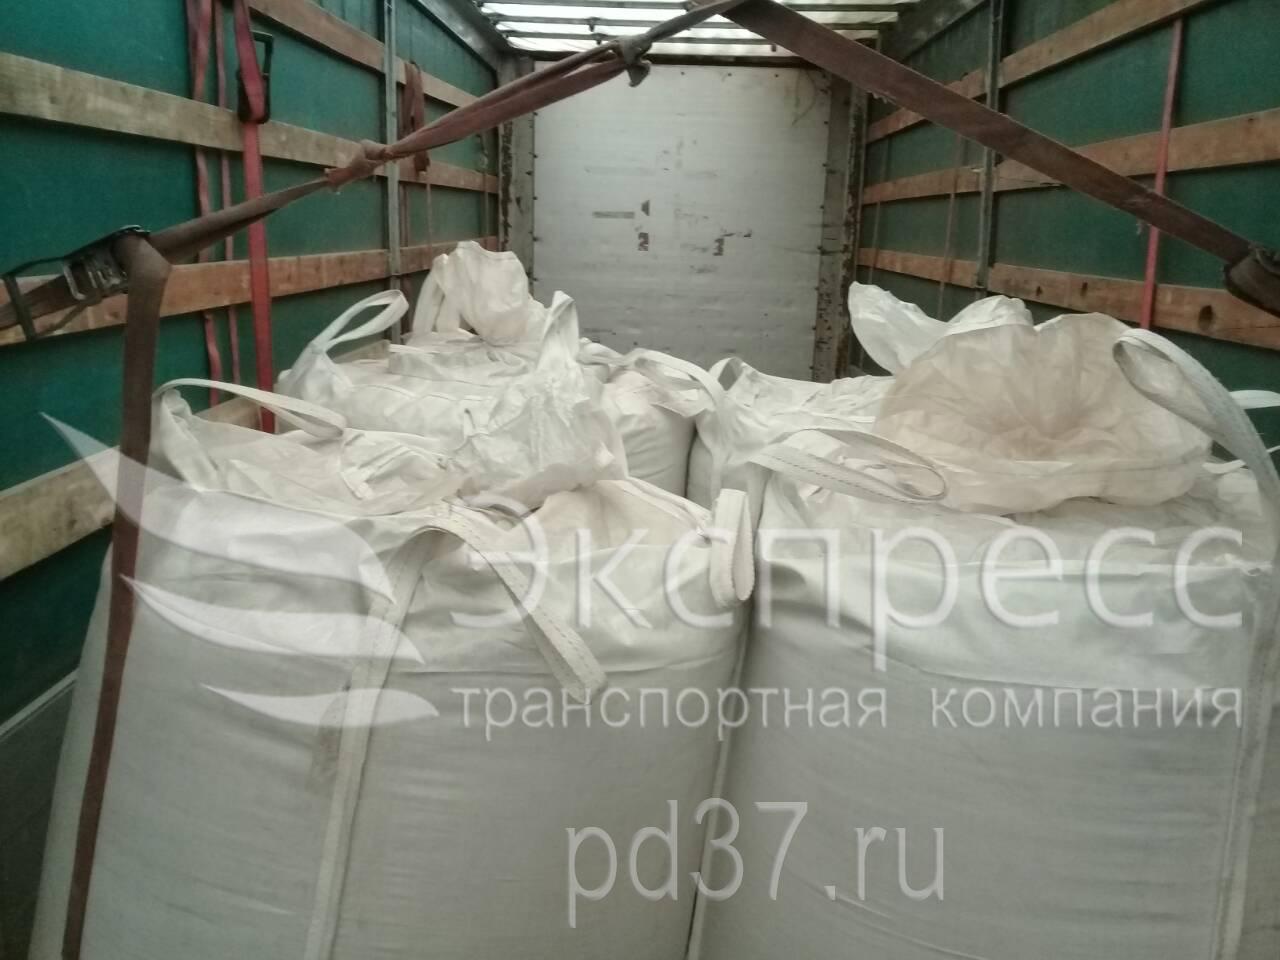 Перевозка зерна в биг-бэгах